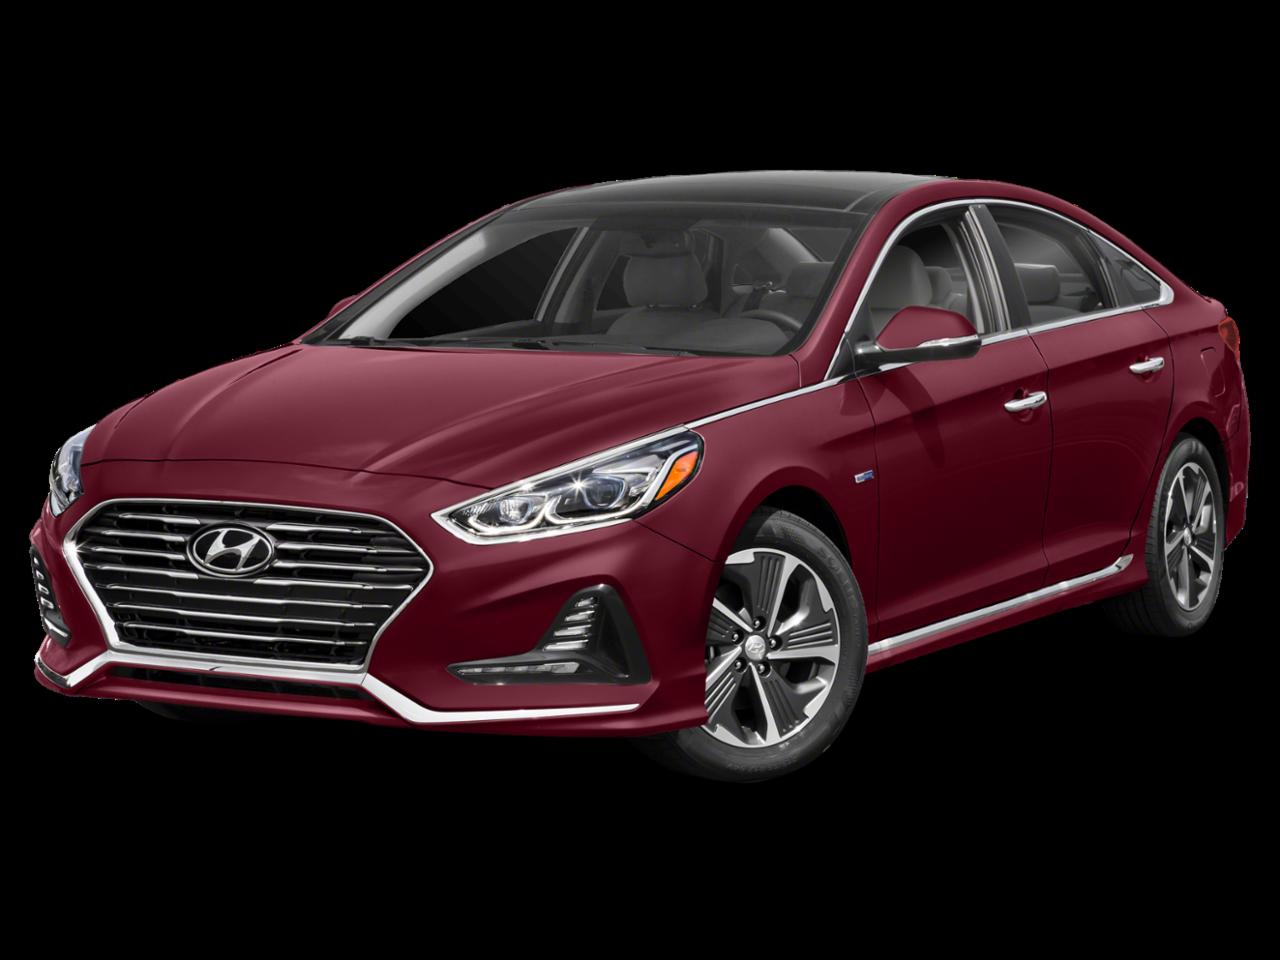 Hyundai 2019 Sonata Hybrid Limited